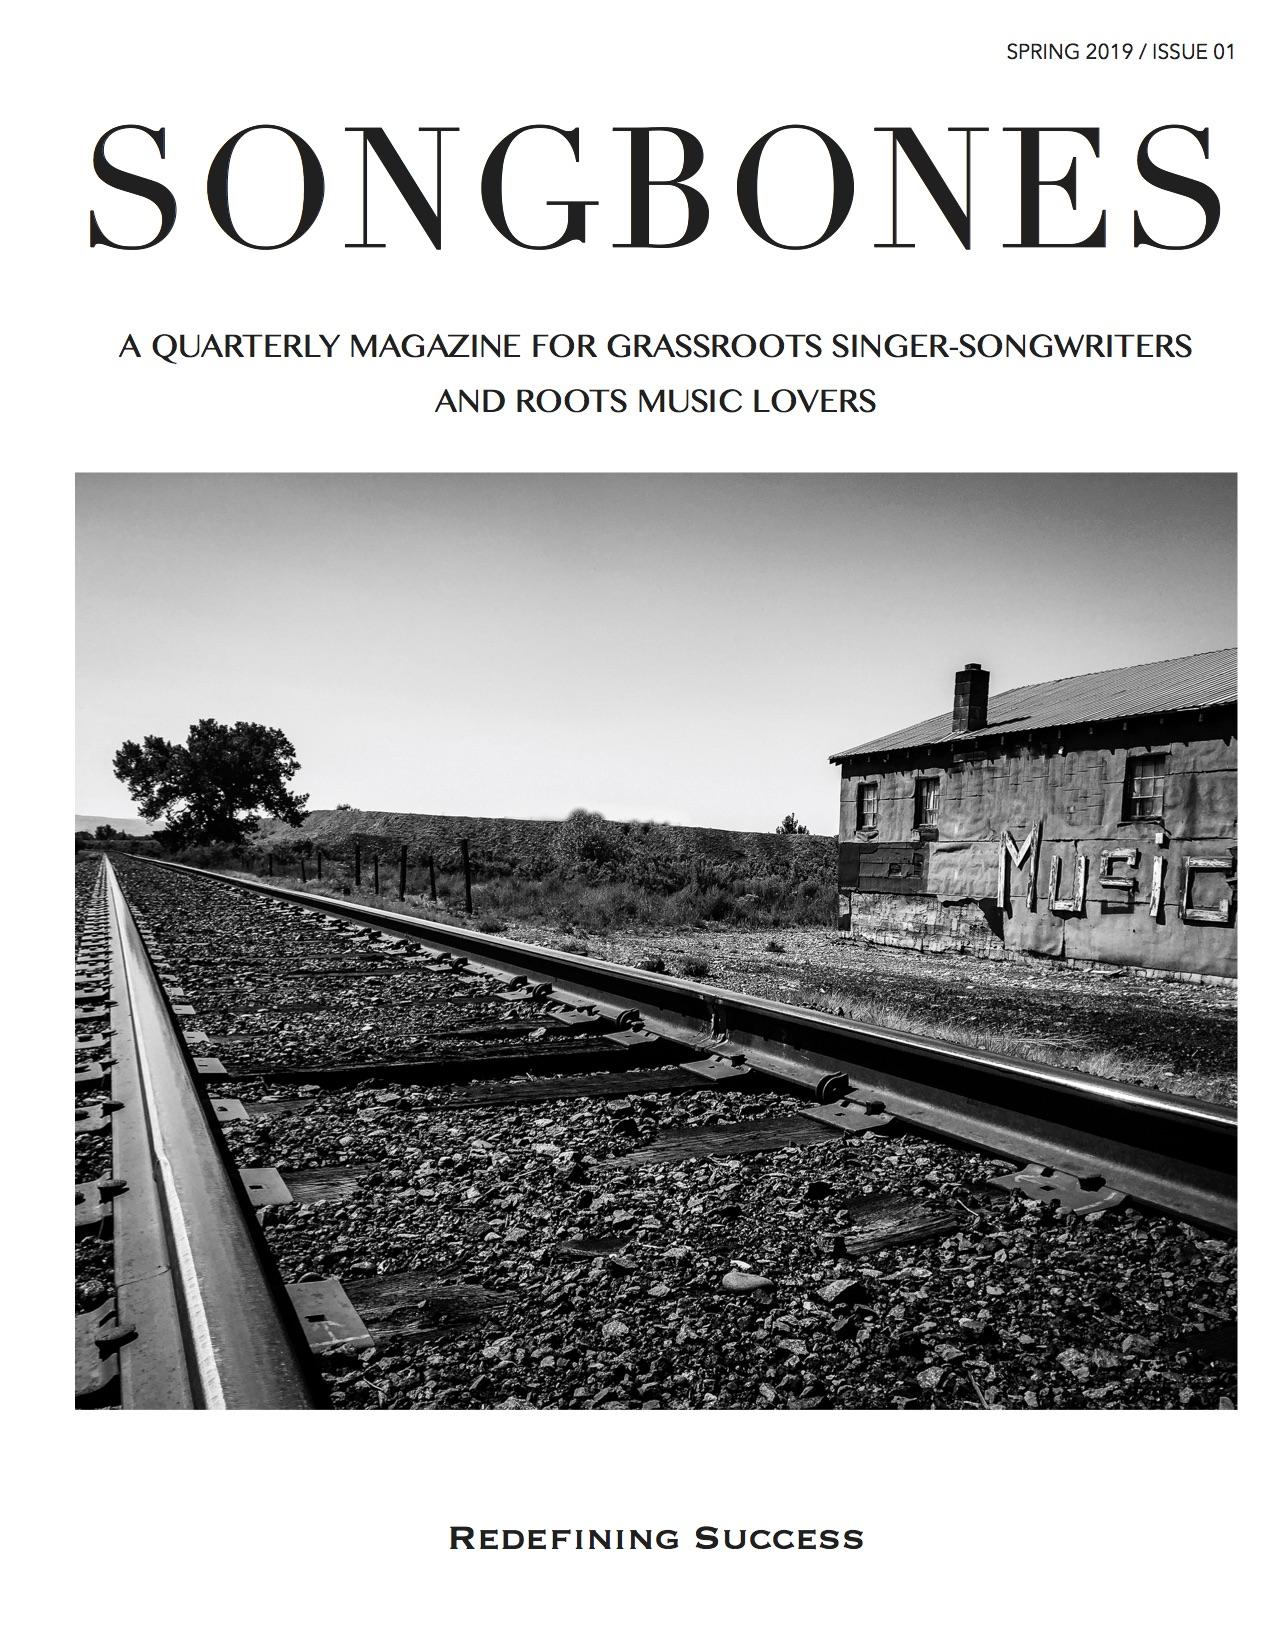 SONGBONES - Issue 01_CoverPage.jpg